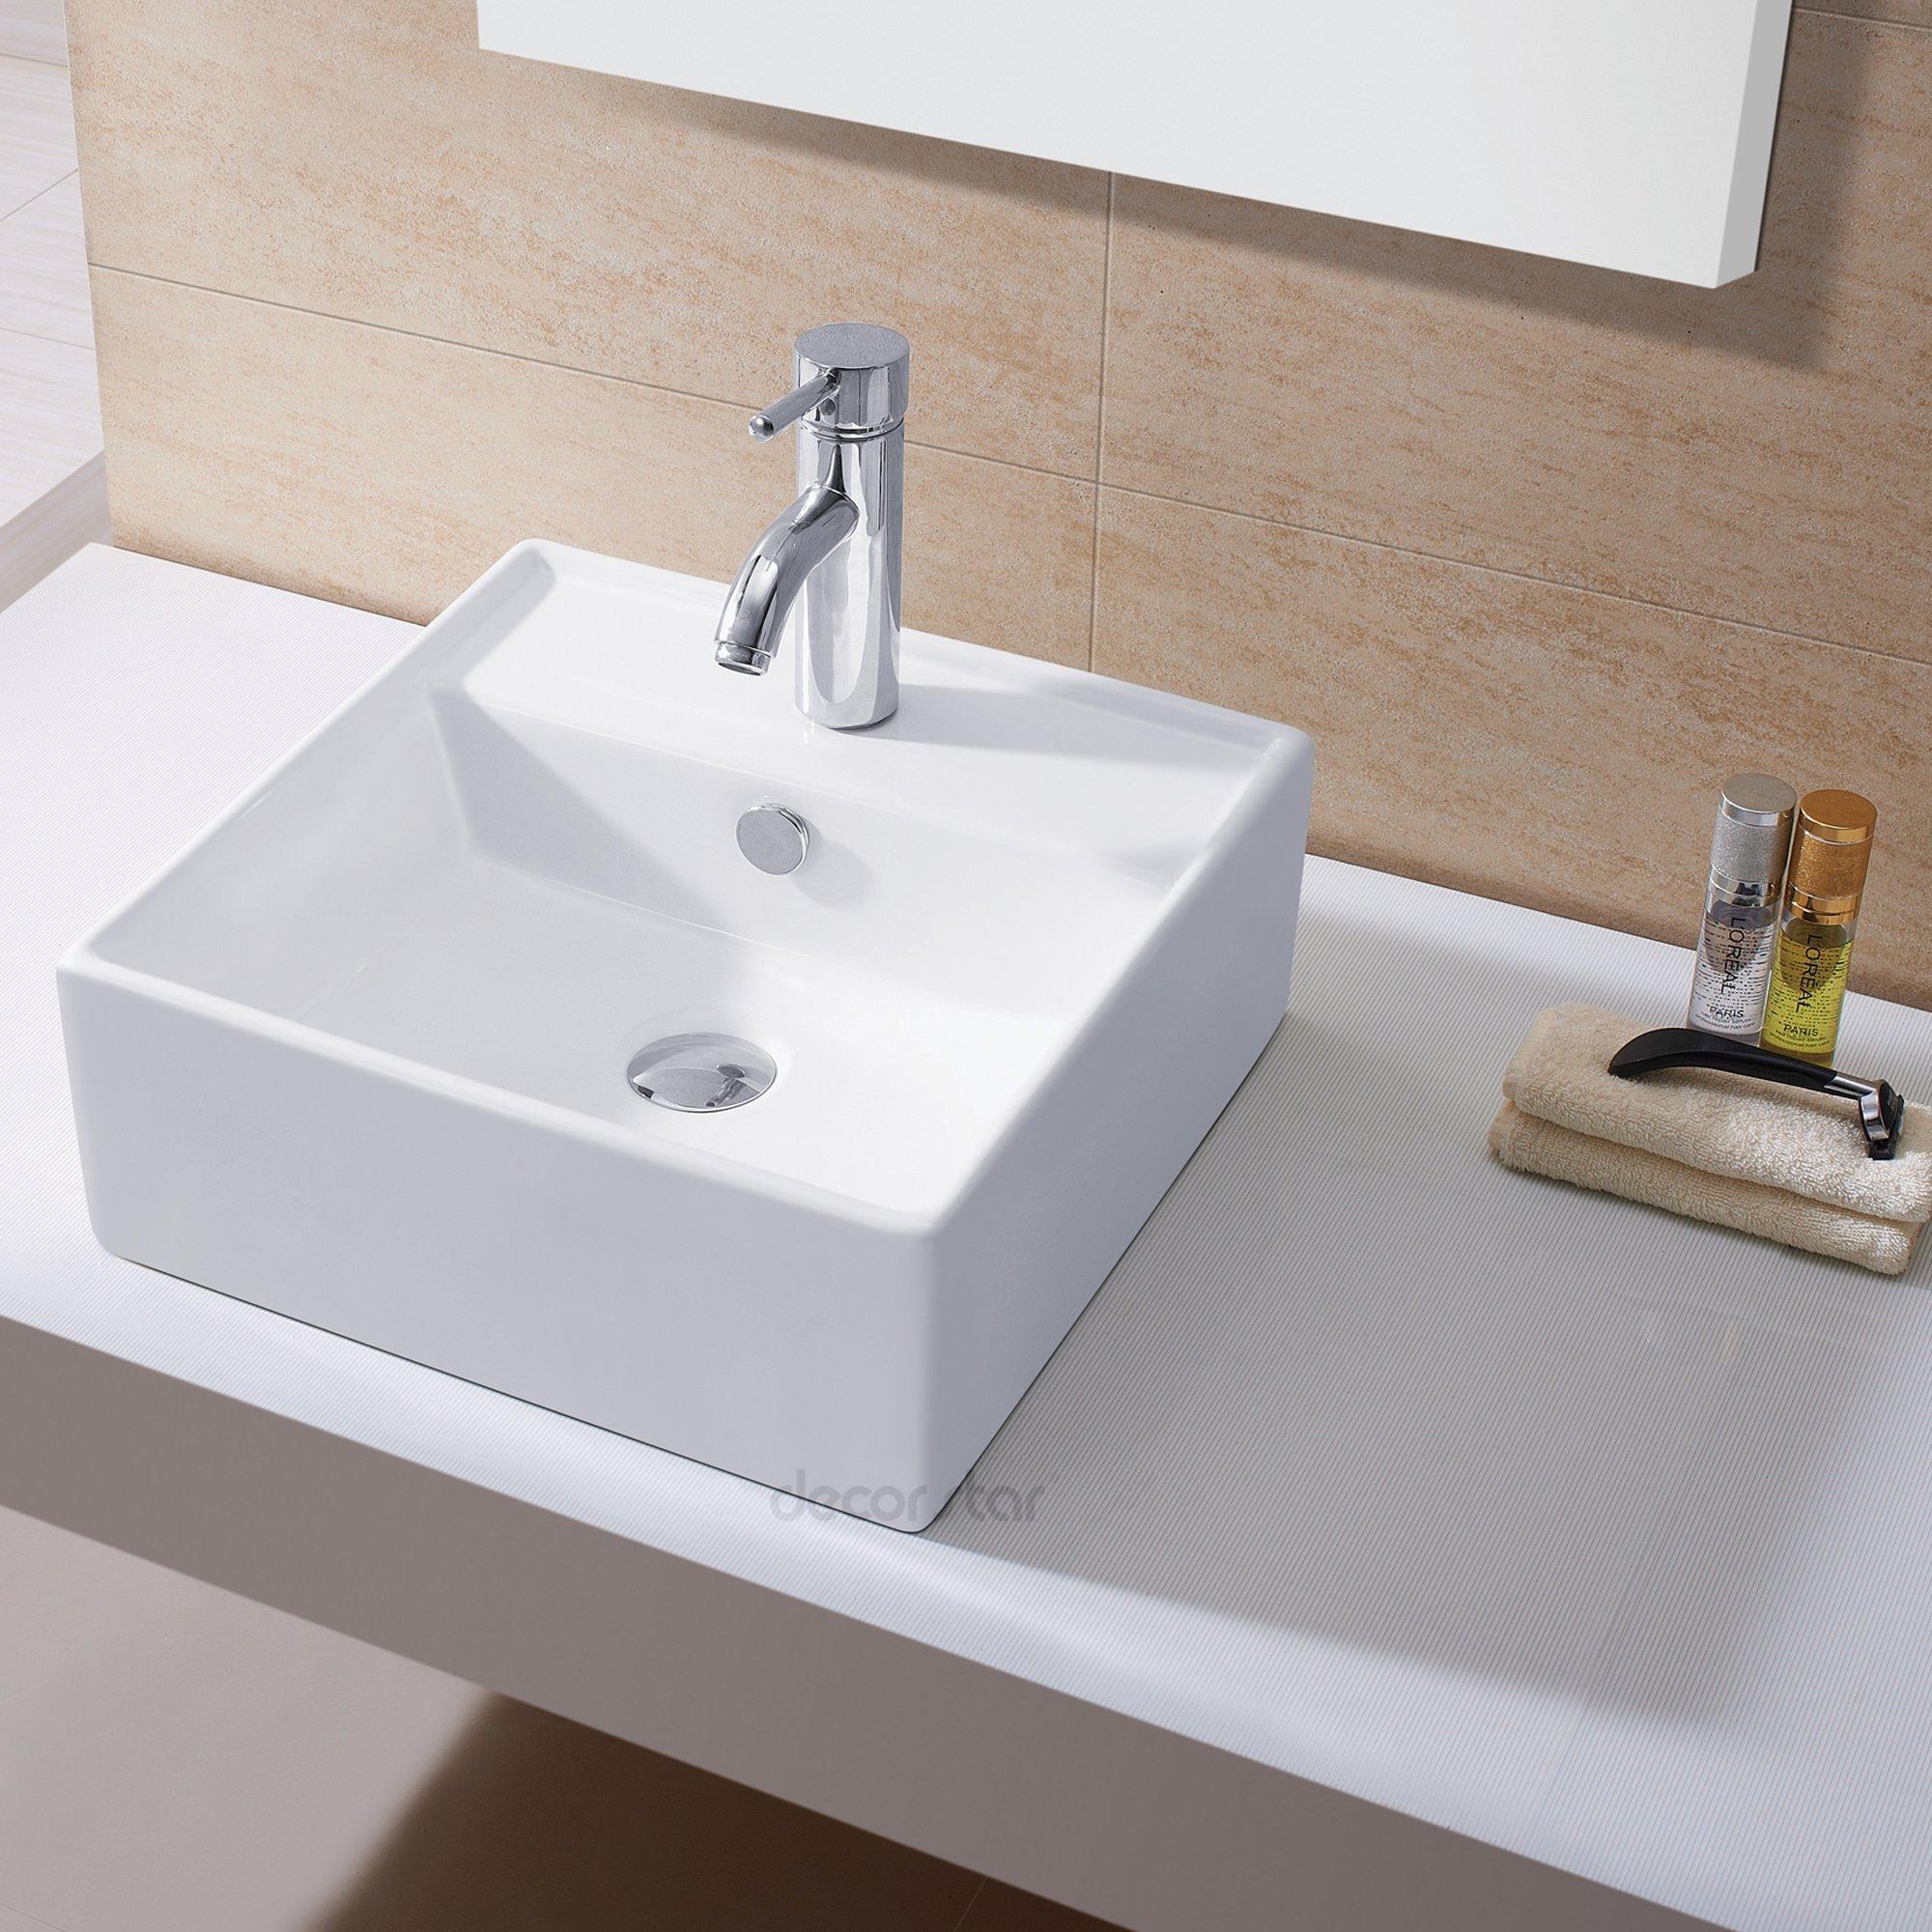 Decor Star CB-019 Bathroom Porcelain Ceramic Vessel Vanity Sink Art Basin